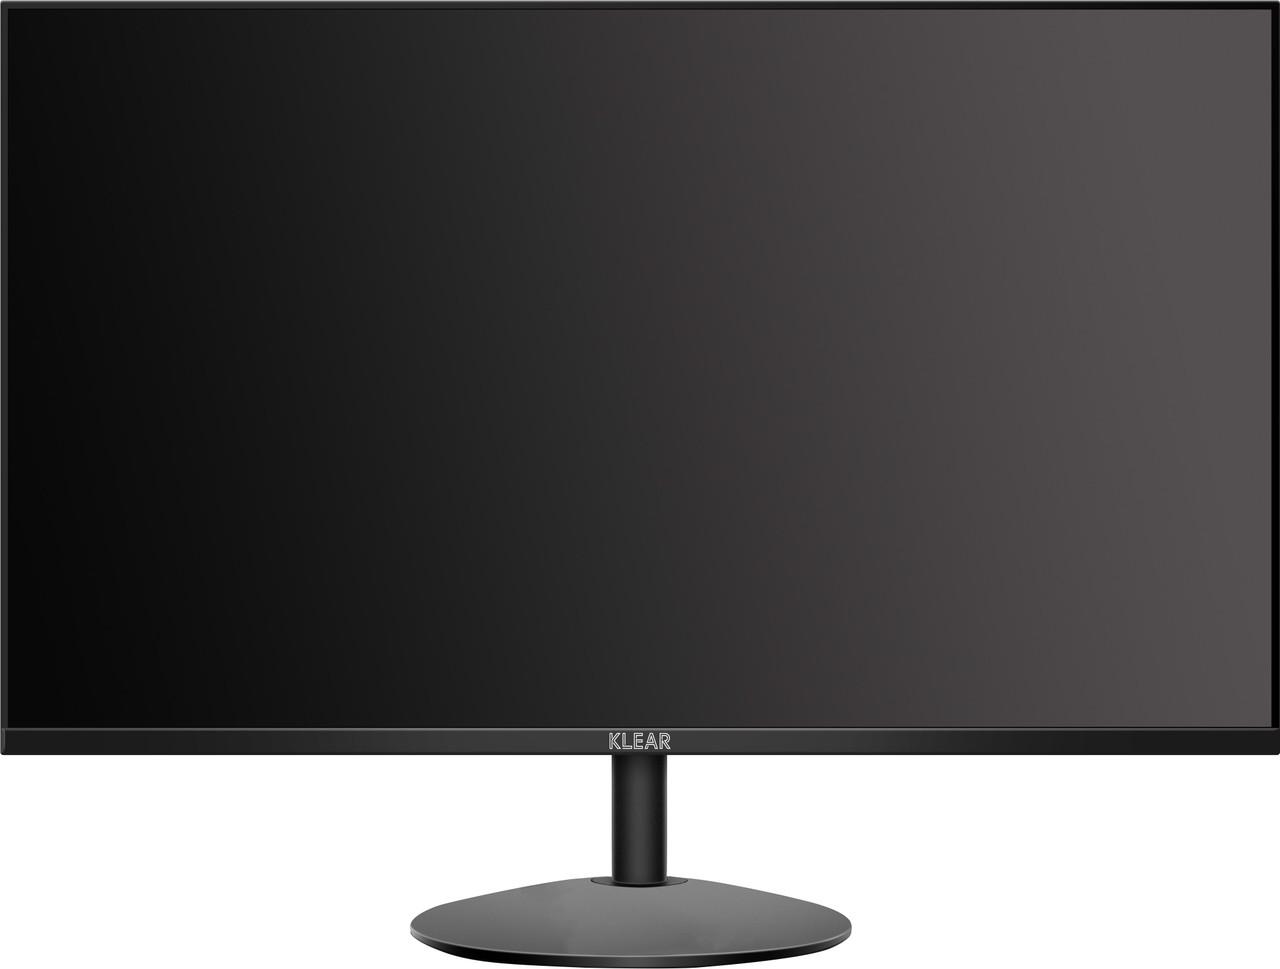 "K-22 LED  21.5"" LED IPS HDMI VGA BNC CCTV Monitor Full HD 1920 x 1080 Vesa"